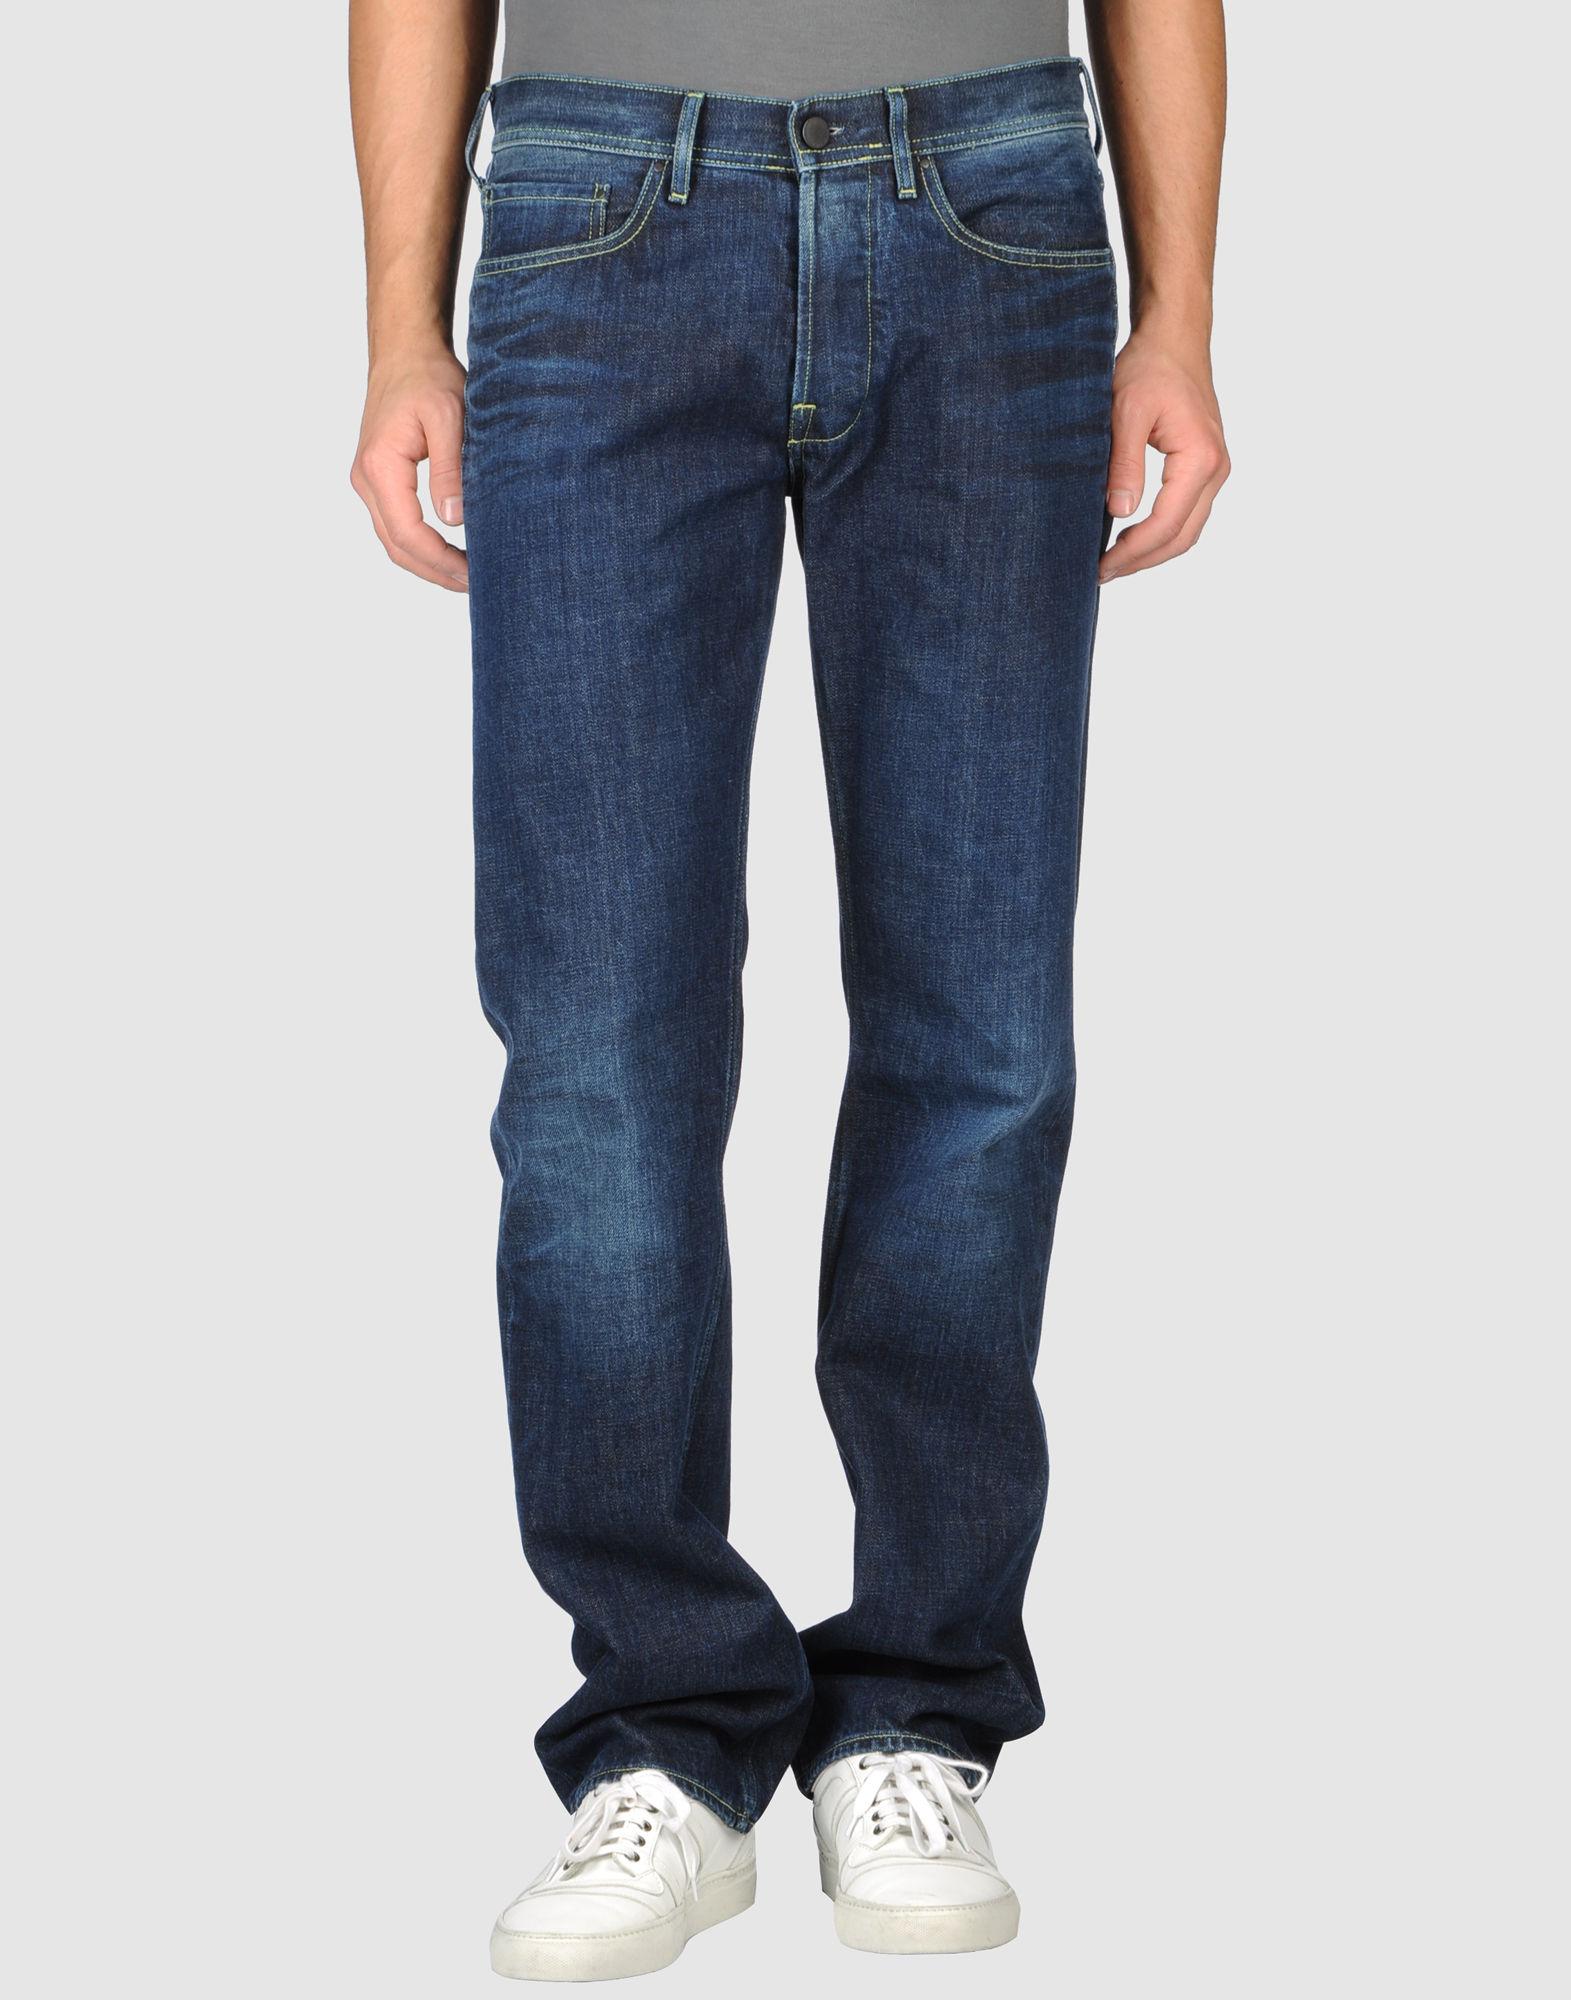 stone island denims jeans in blue for men lyst. Black Bedroom Furniture Sets. Home Design Ideas